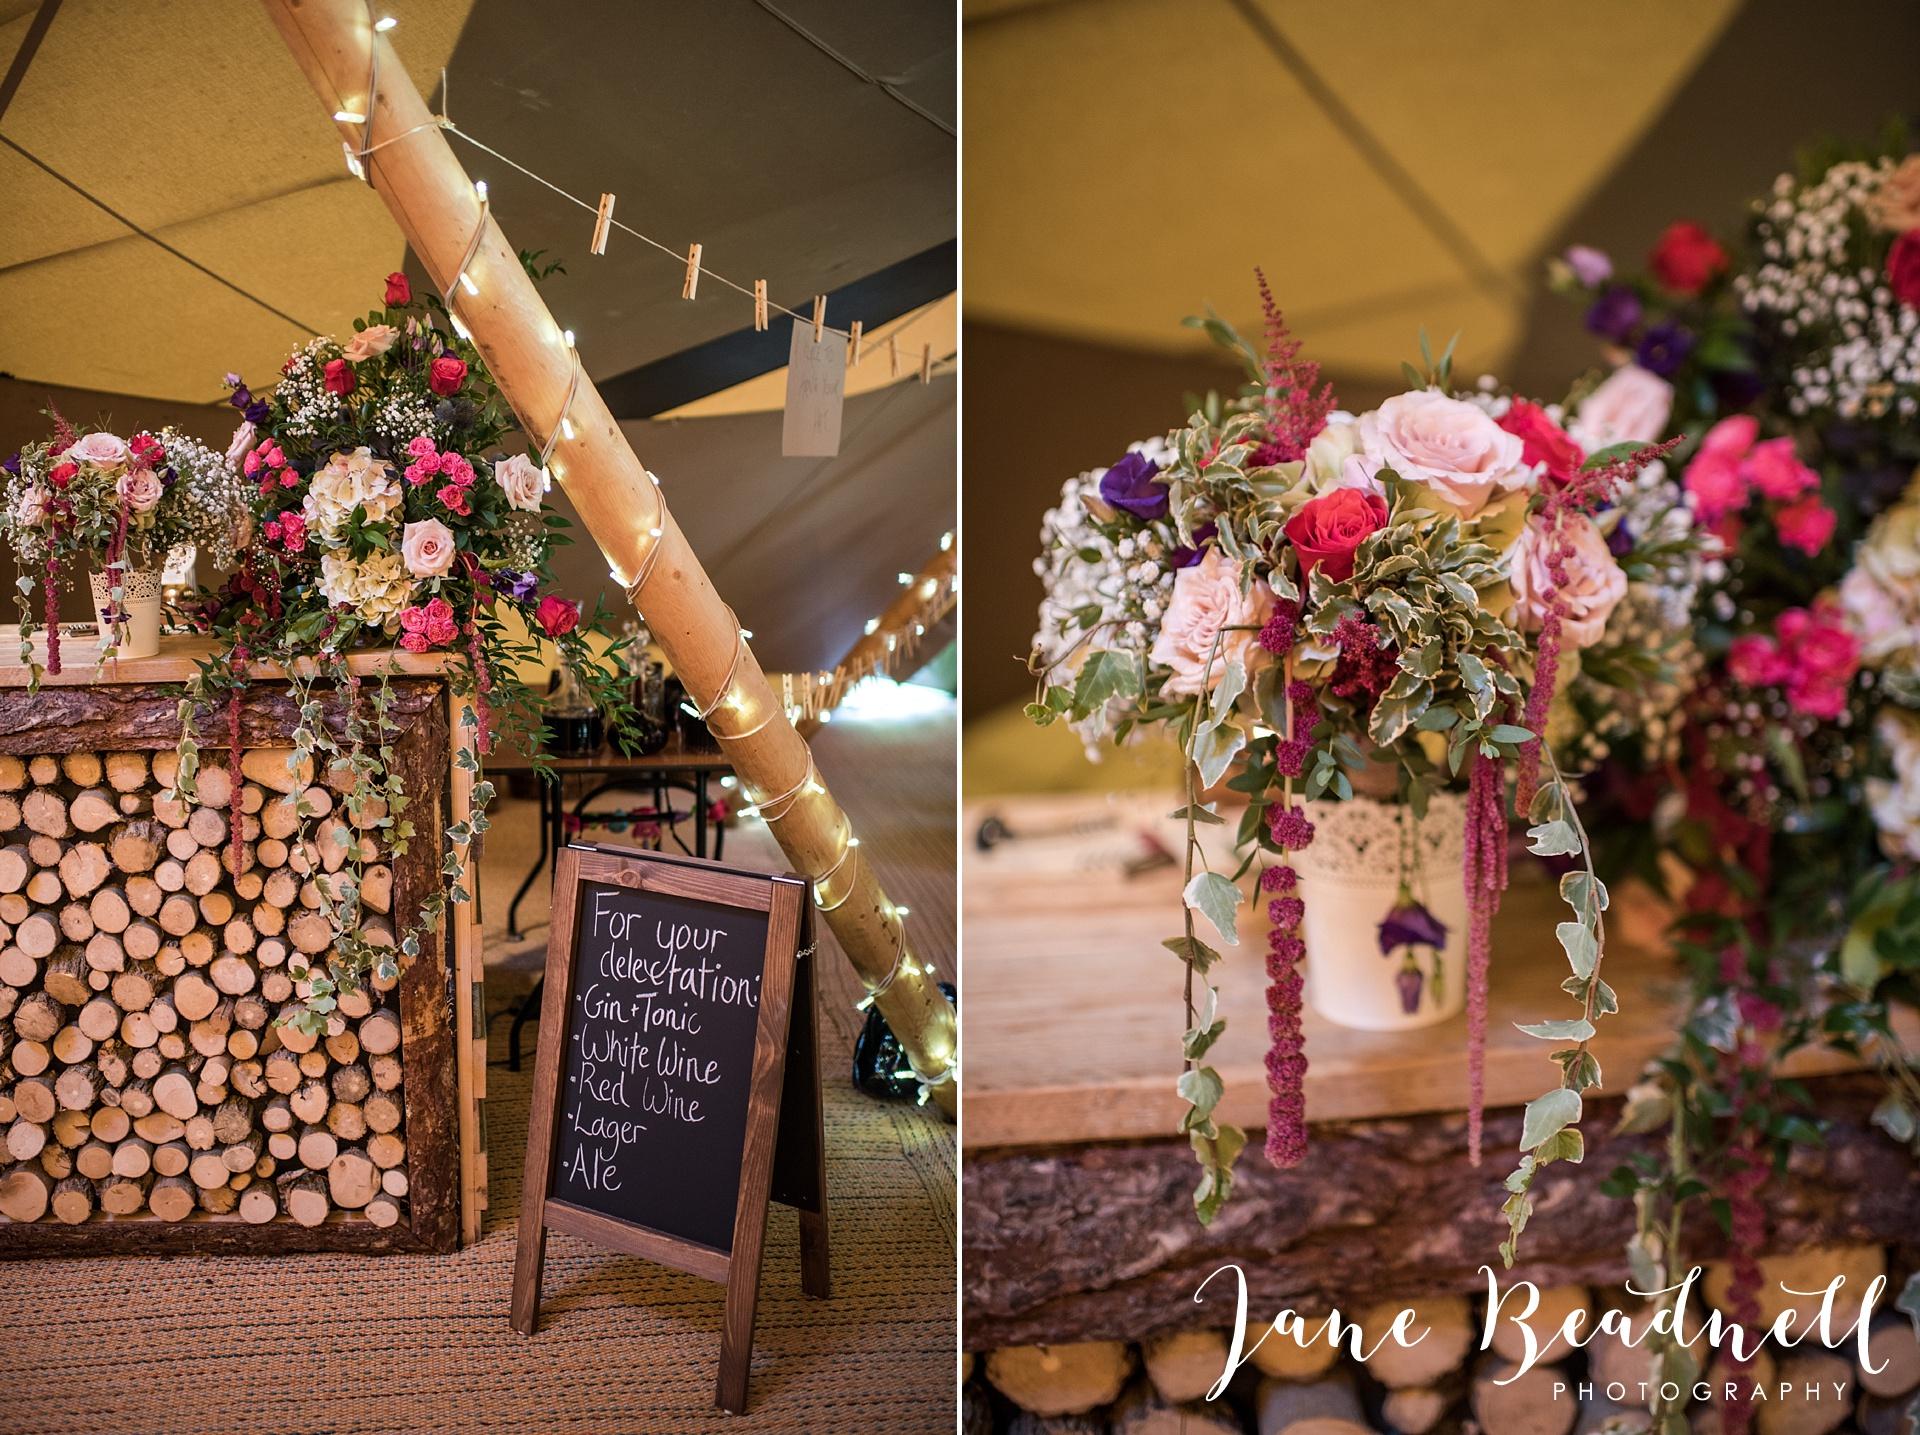 fine-art-wedding-photographer-jane-beadnell-yorkshire-wedding-photographer_0123